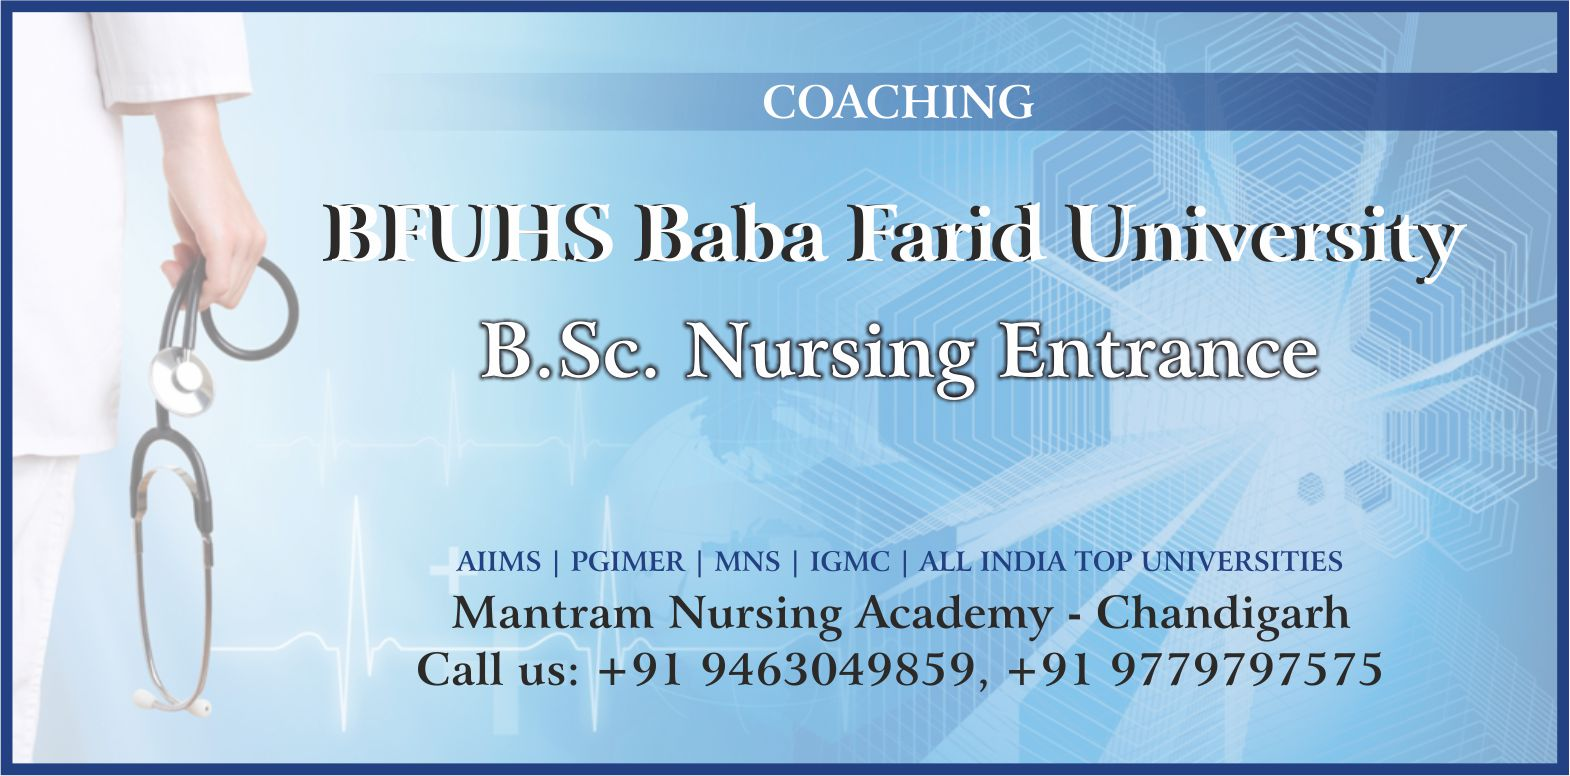 EXAM PATTERN B Sc  NURSING ENTRANCE BABA FARID UNIVERSITY BFUHS